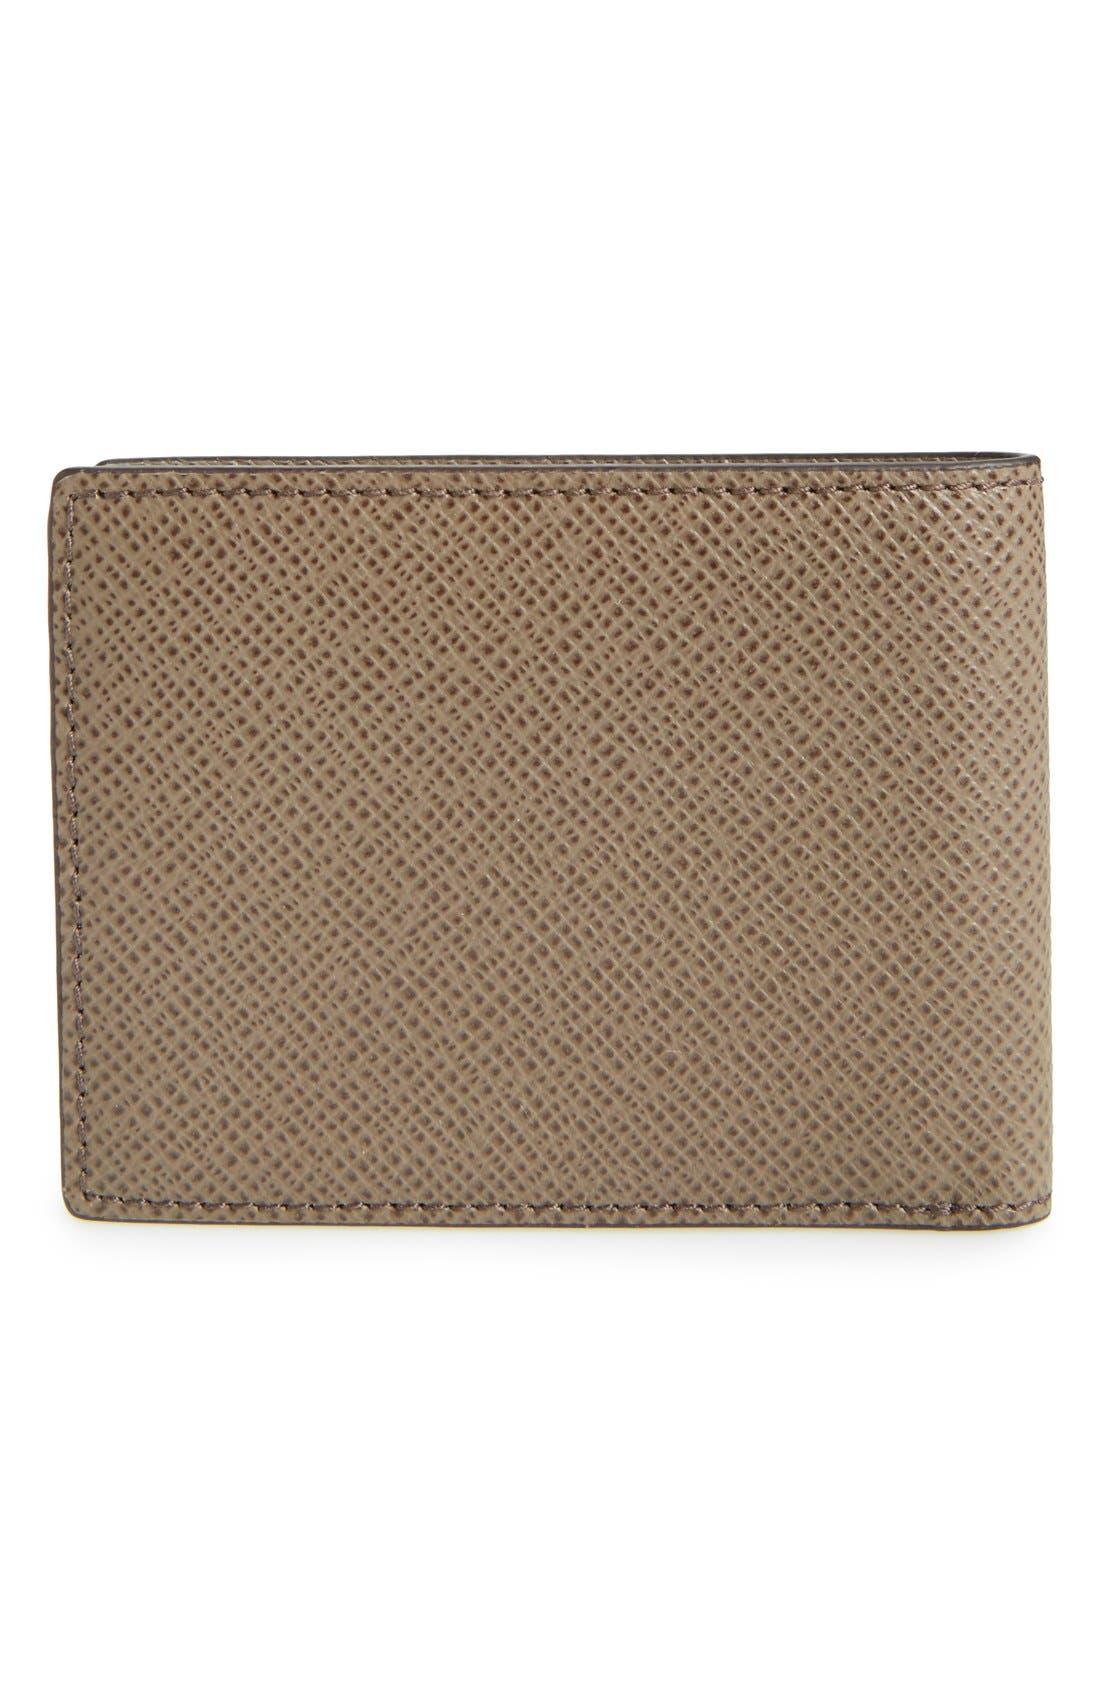 'Signature' Bifold Wallet,                             Alternate thumbnail 10, color,